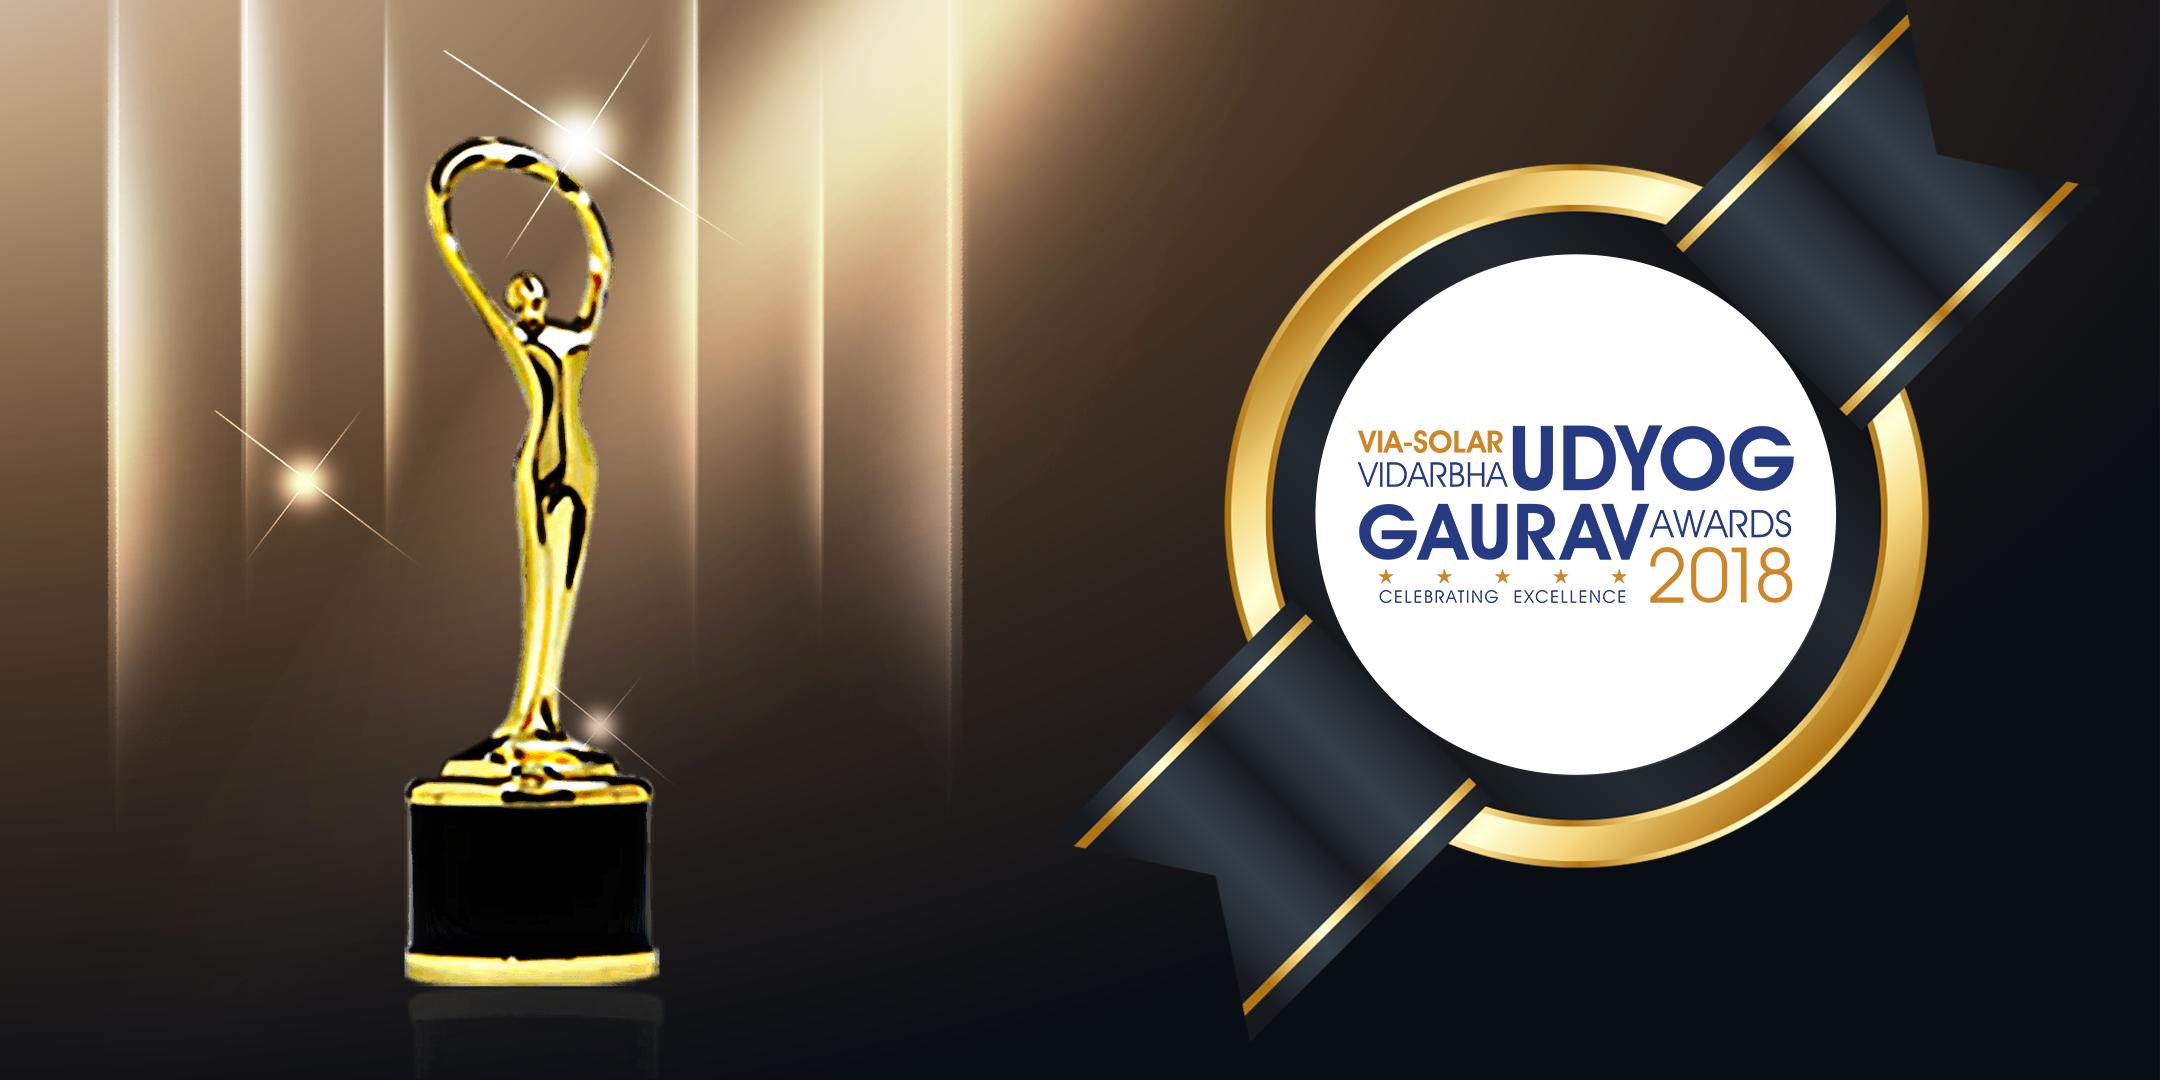 VIA-Solar Vidarbha Udyog Gaurav Awards 2018